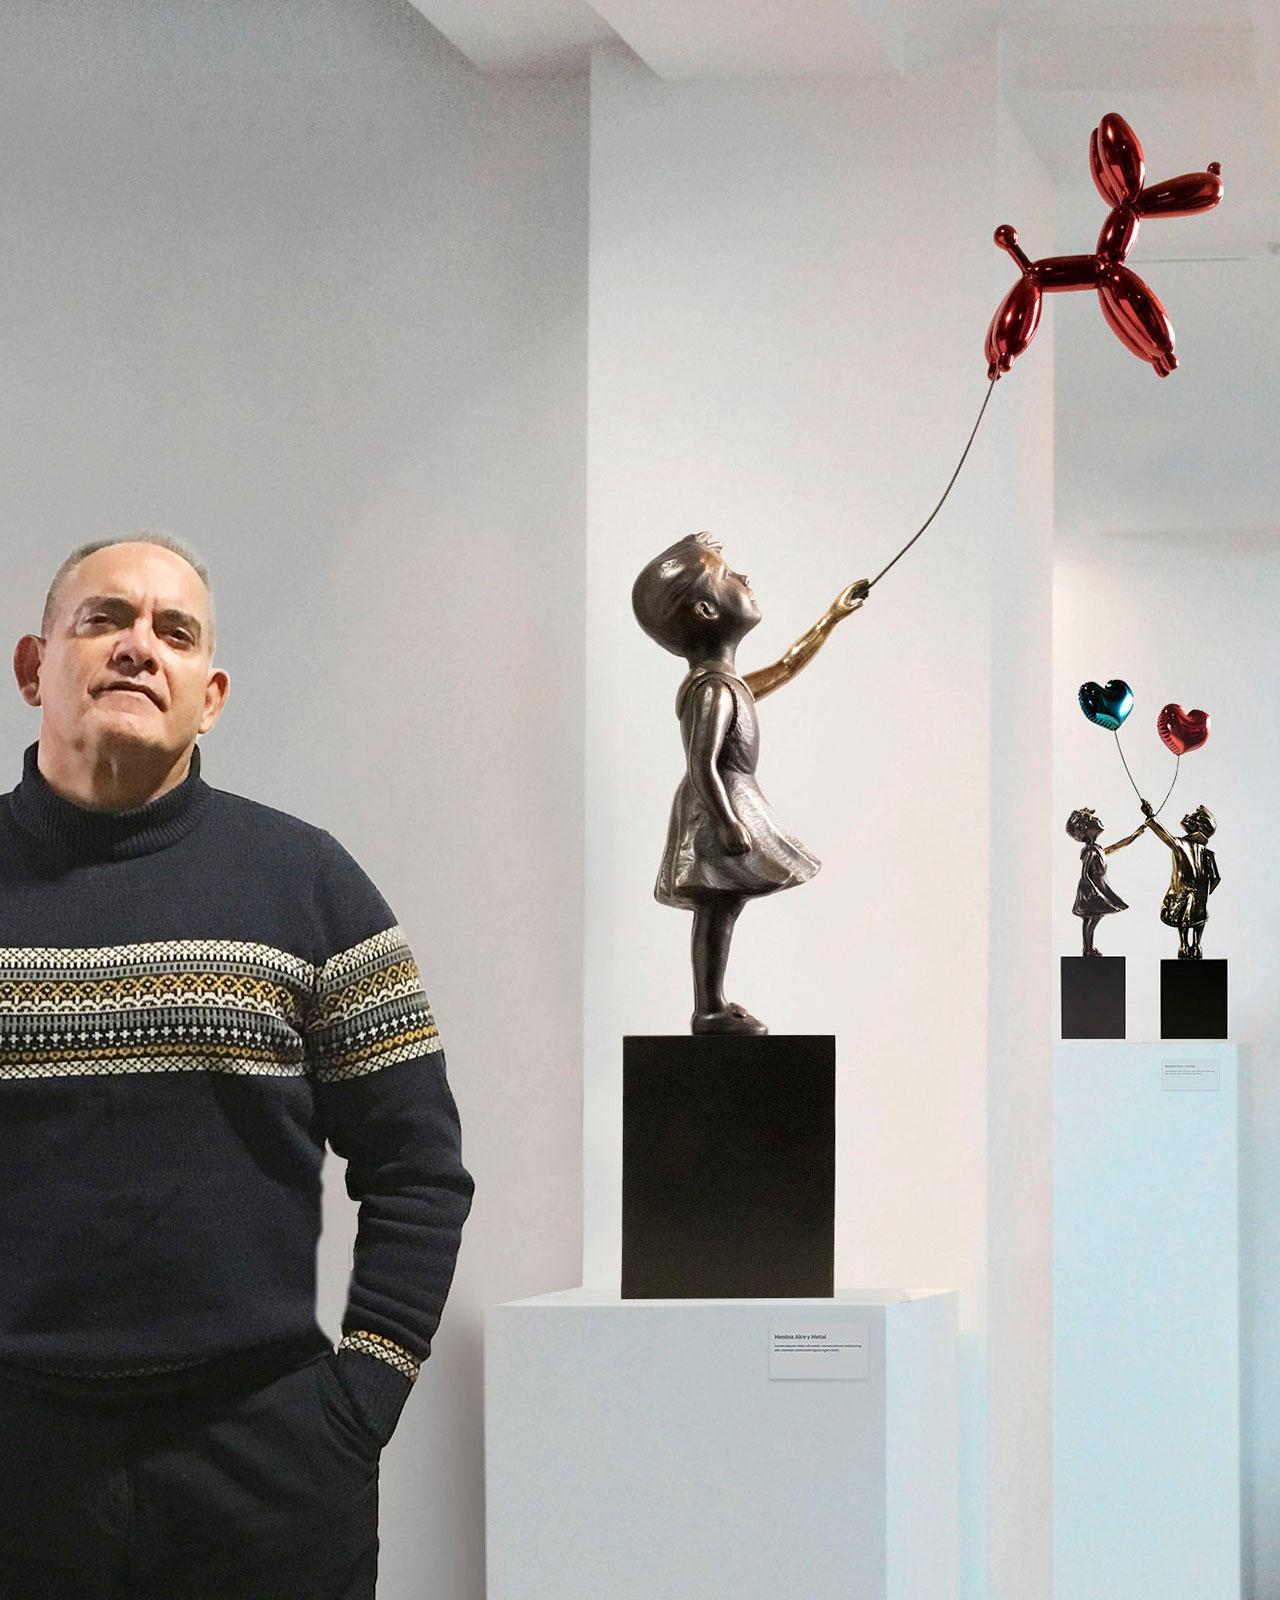 Girl with balloon dog 74 – Miguel Guía Street Art Cast bronze Sculpture Big